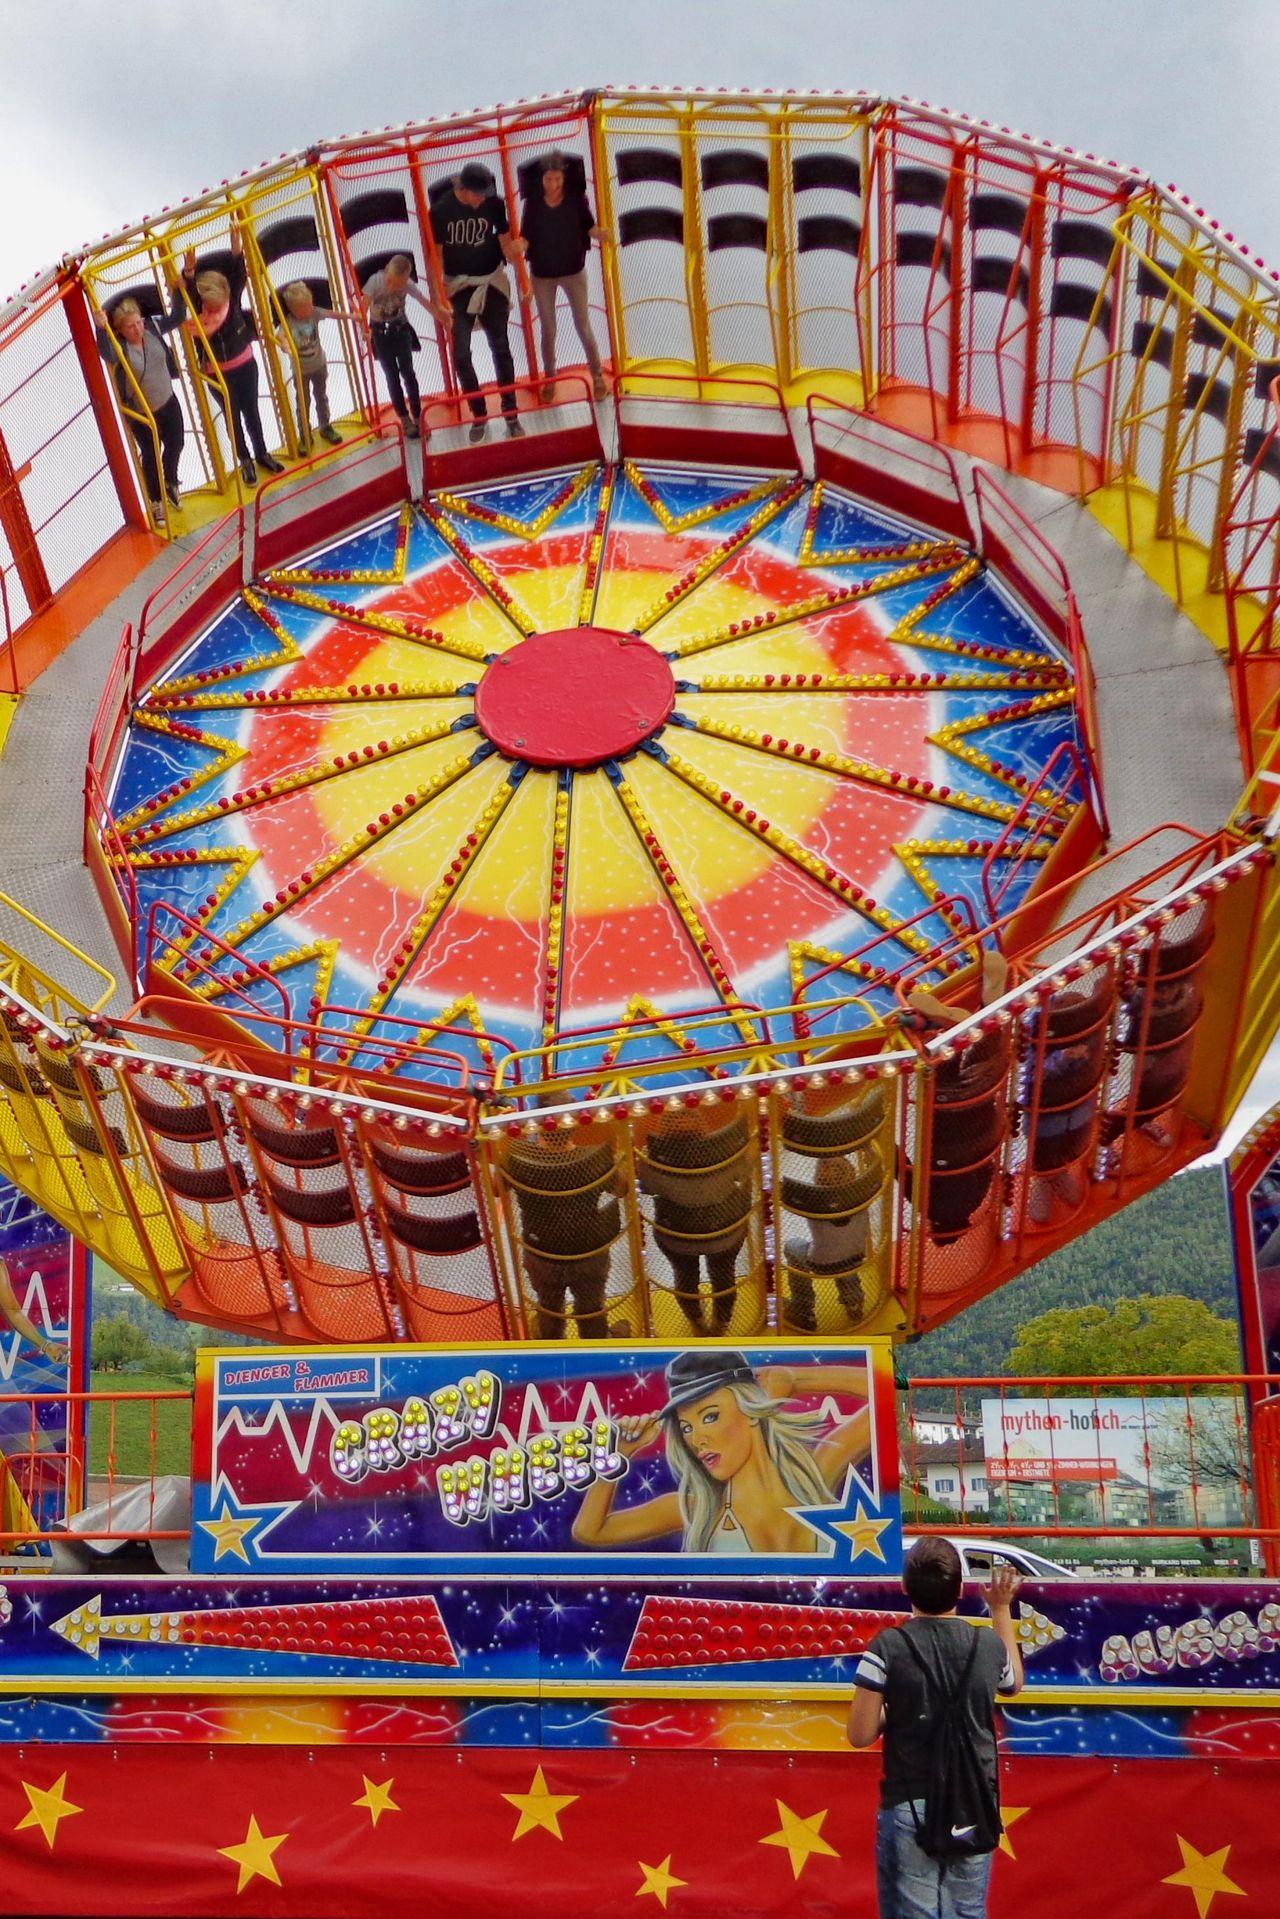 Schwyzer Chilbi fair